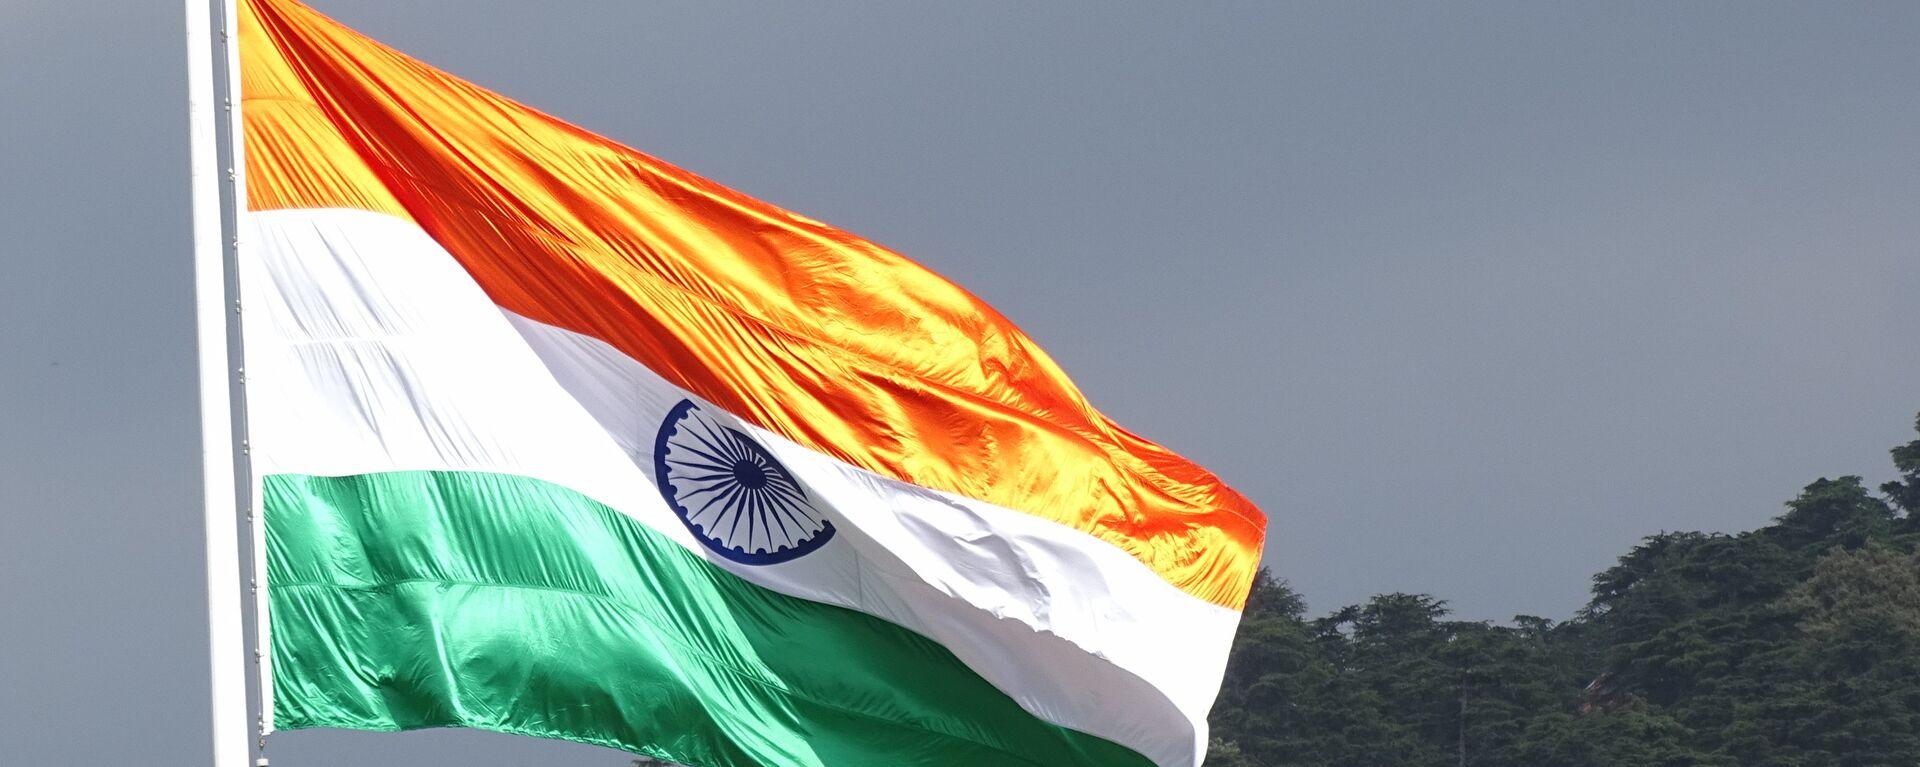 Bandera de la India - Sputnik Mundo, 1920, 10.07.2021